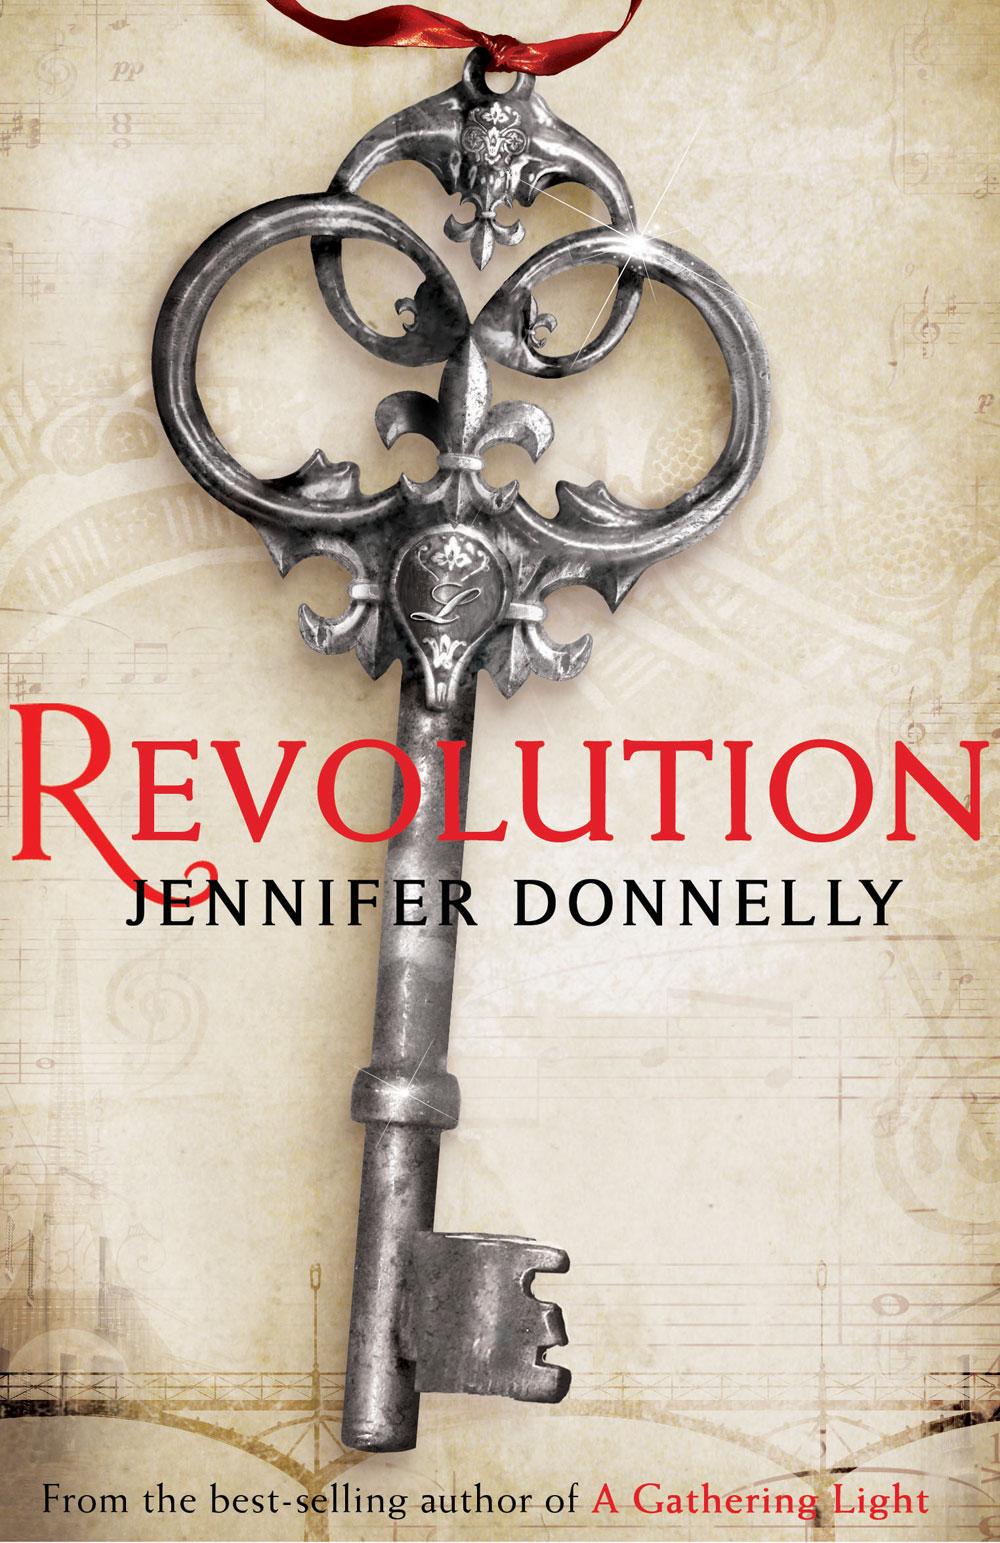 Revolution by Jennifer Donnely review